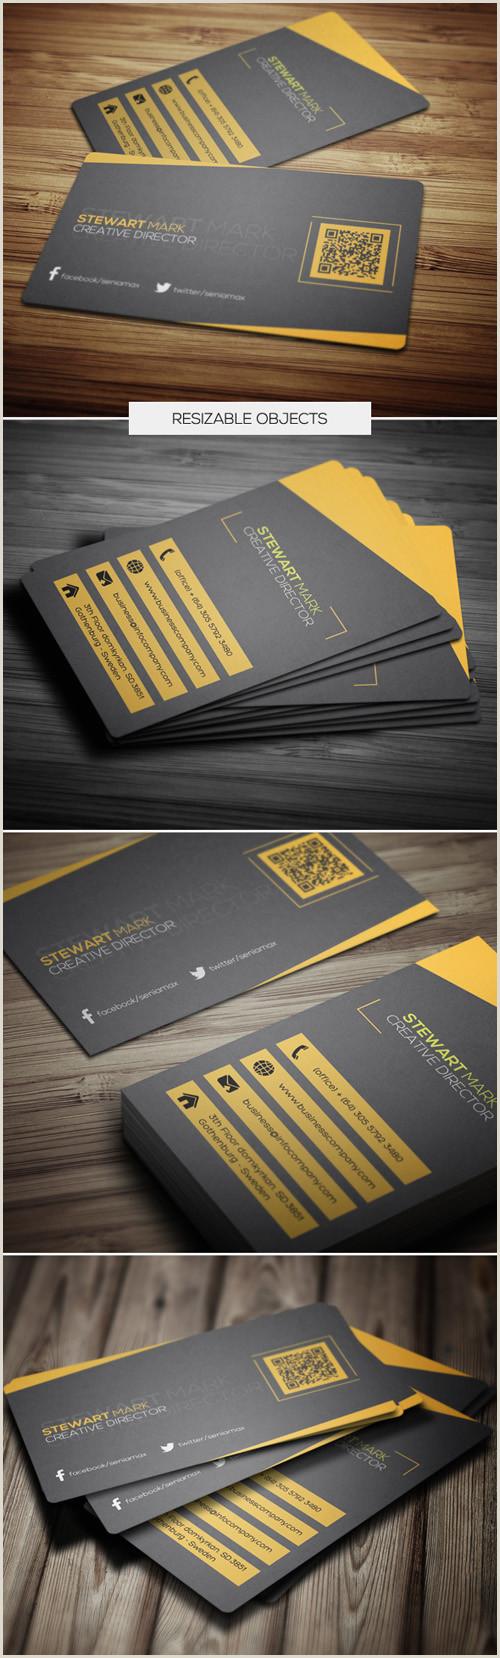 Unique Graphic Design Business Cards 29 High Quality Creative & Unique Business Cards